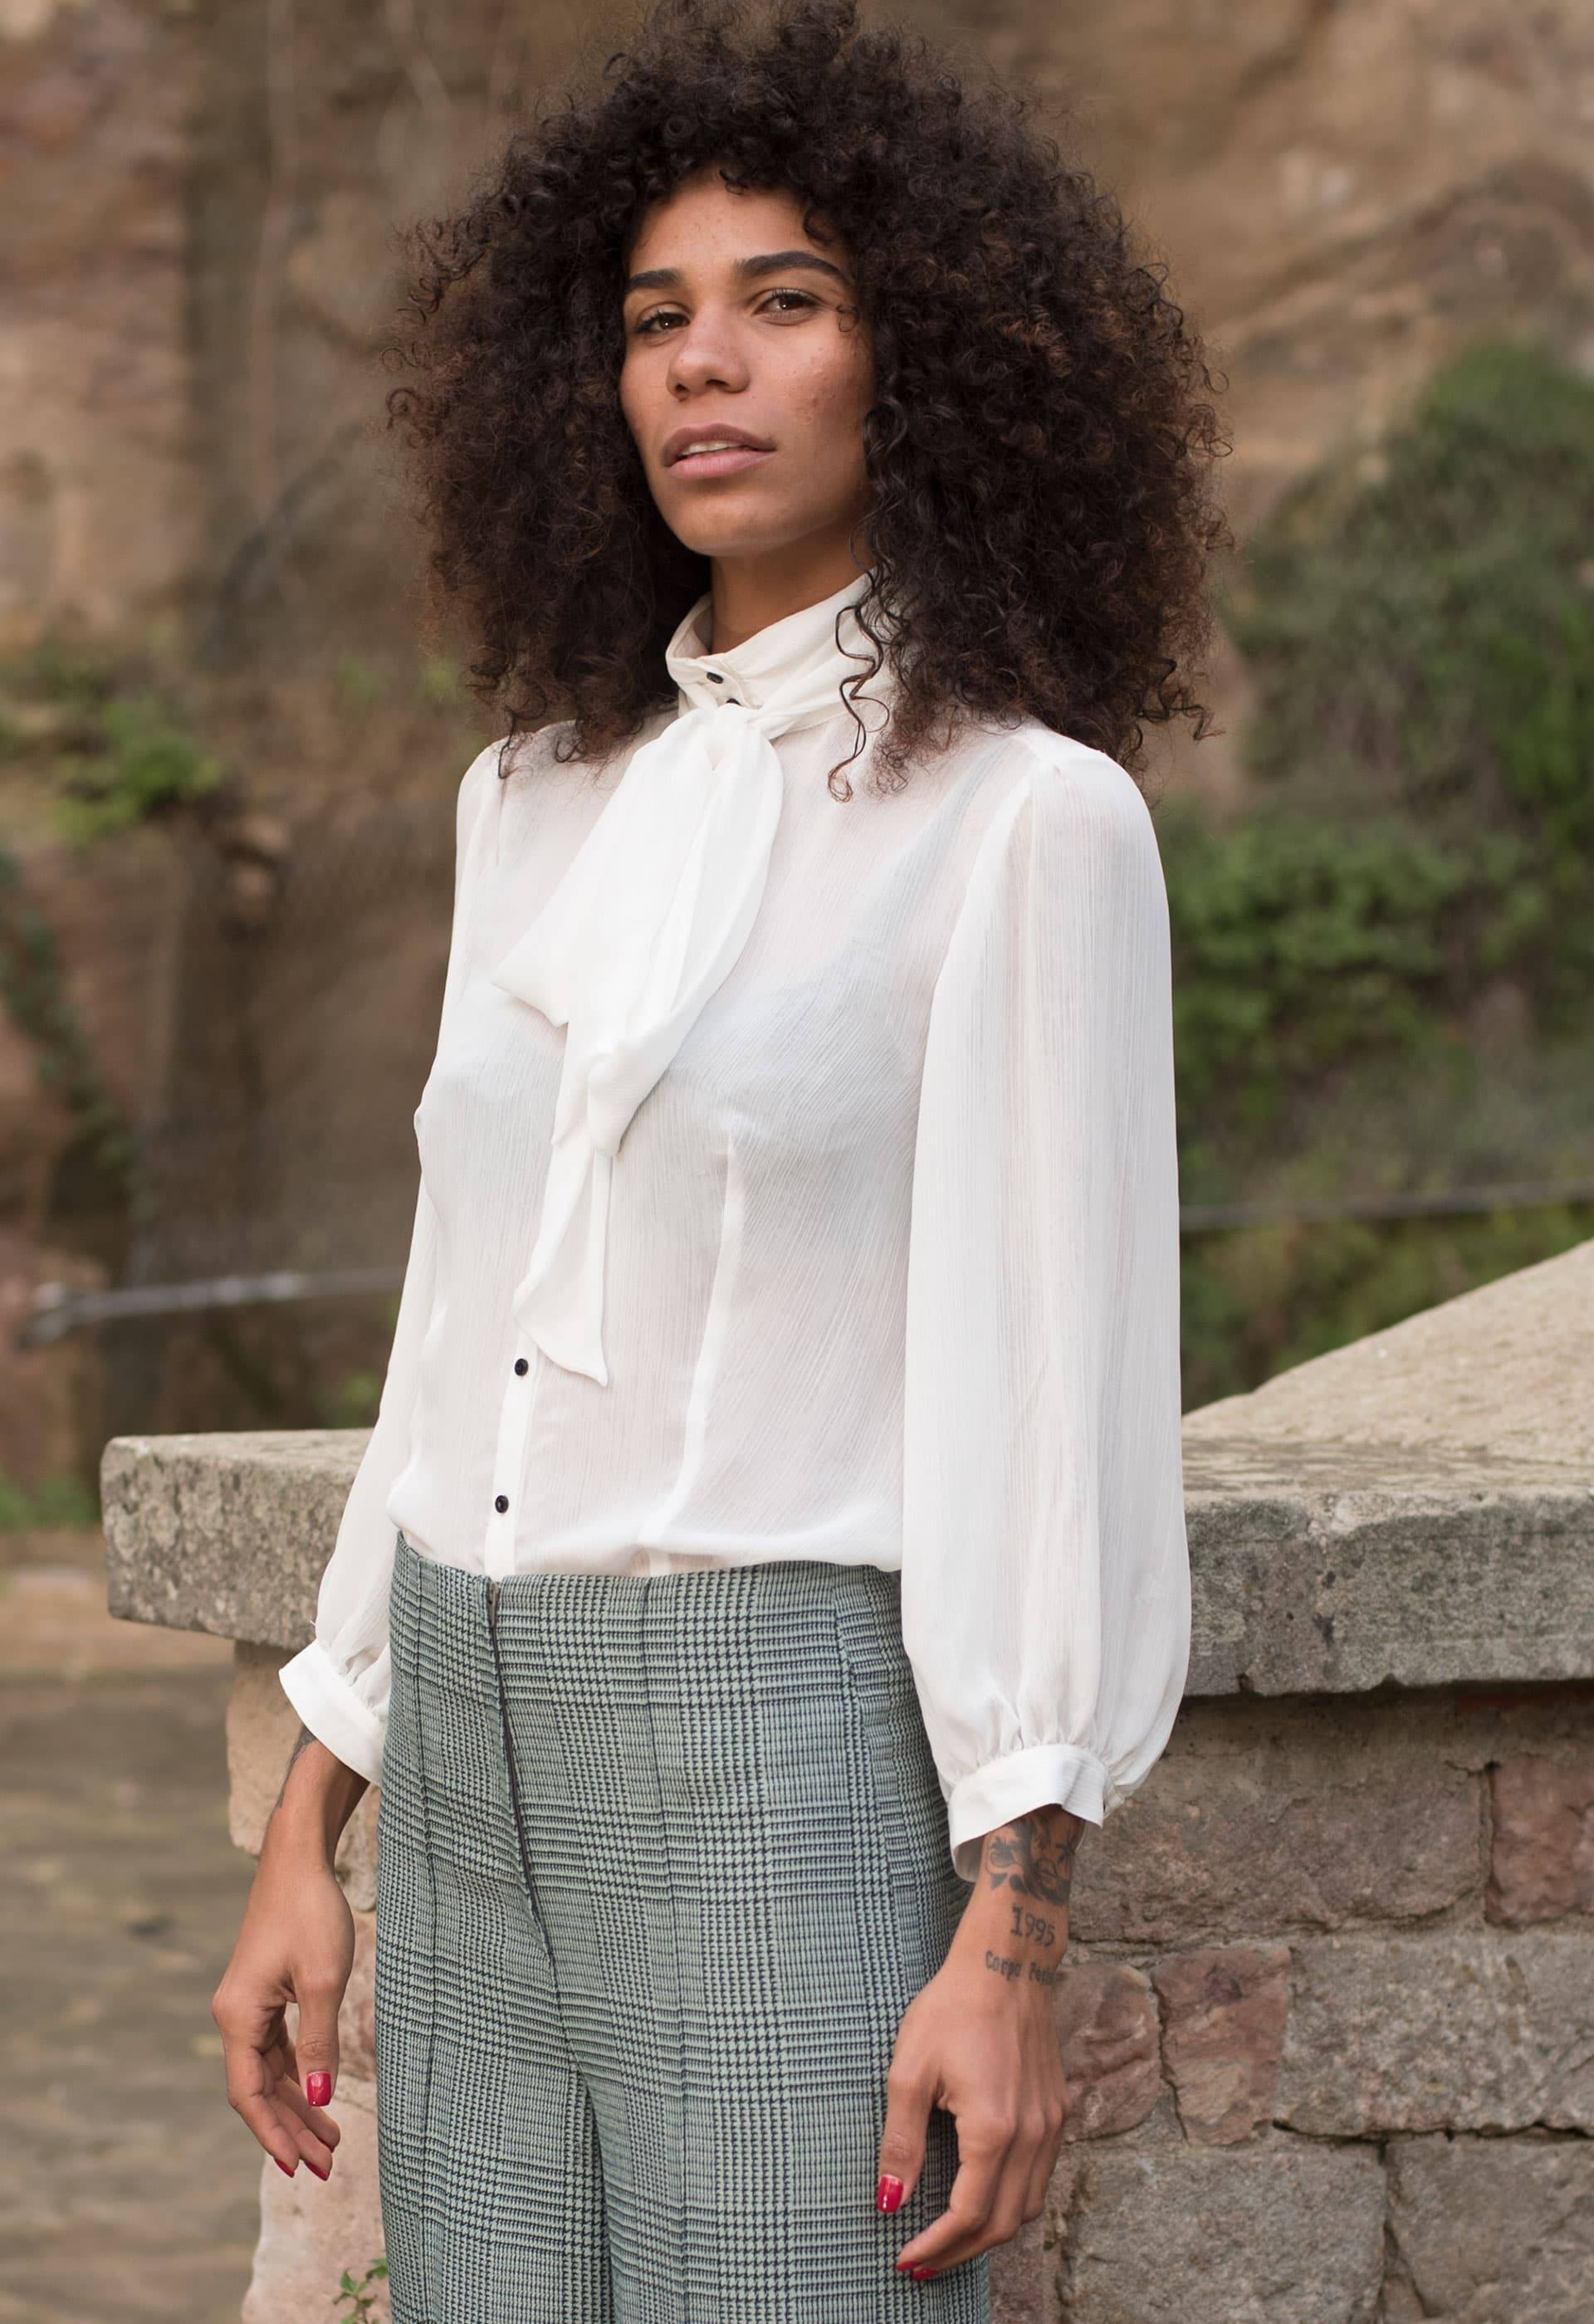 PRÊT À PORTER-FALL WINTER 19/20 - TOPS, BLUSAS - Blusa con lazo blanca de IO DREAMS